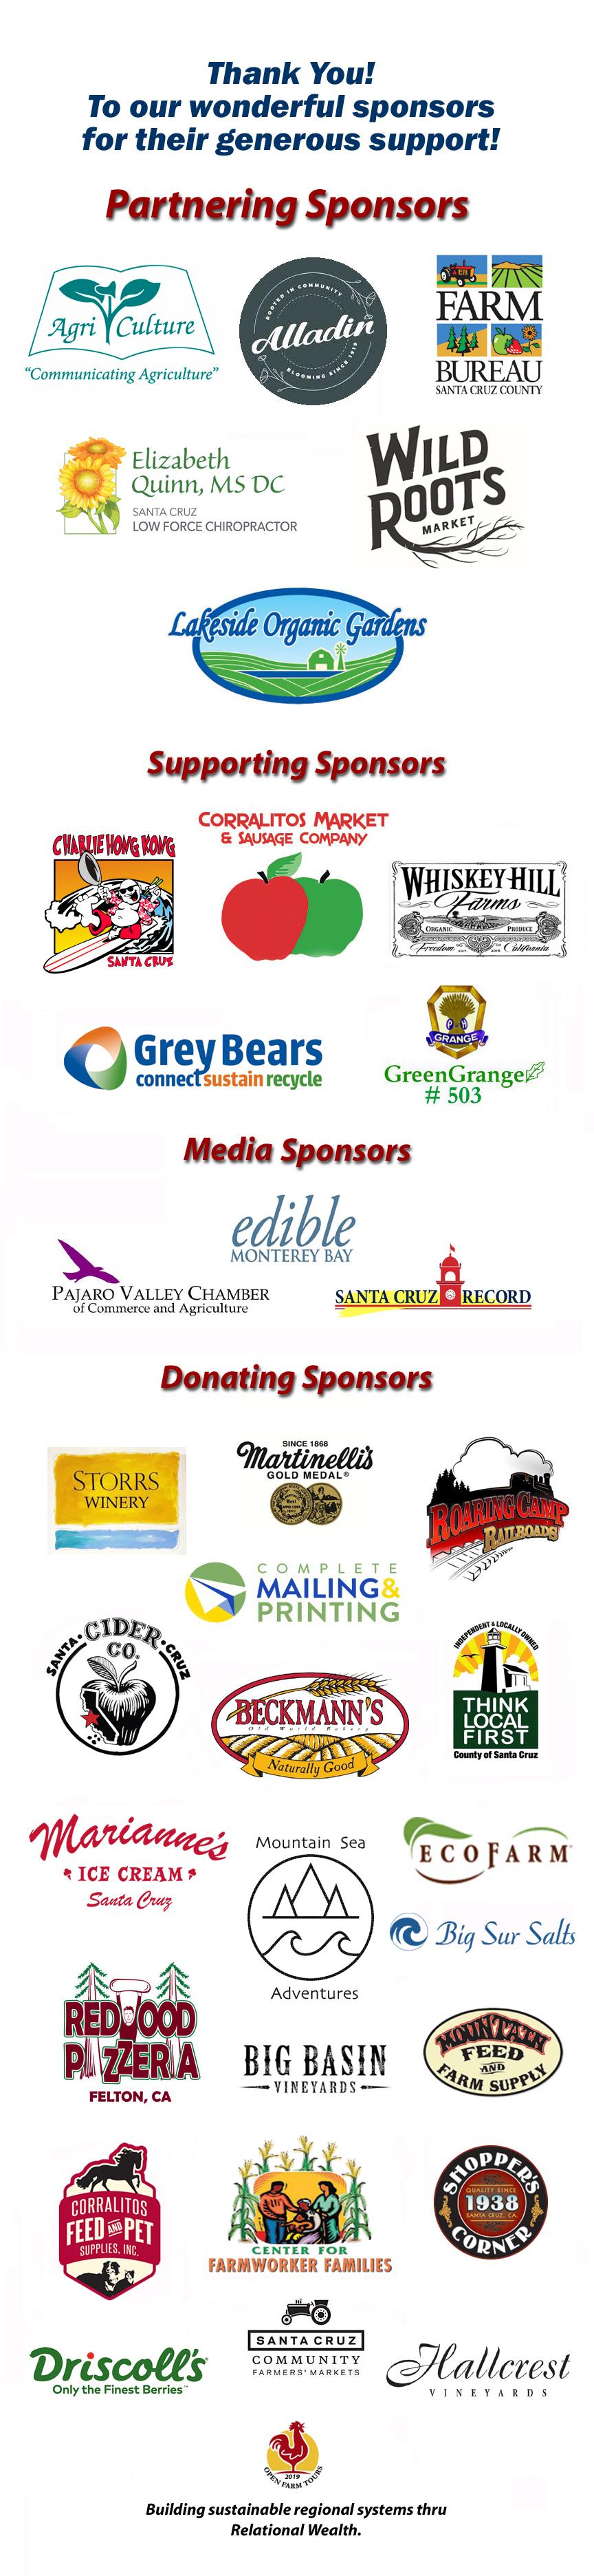 2019 final sponsor web layout copy